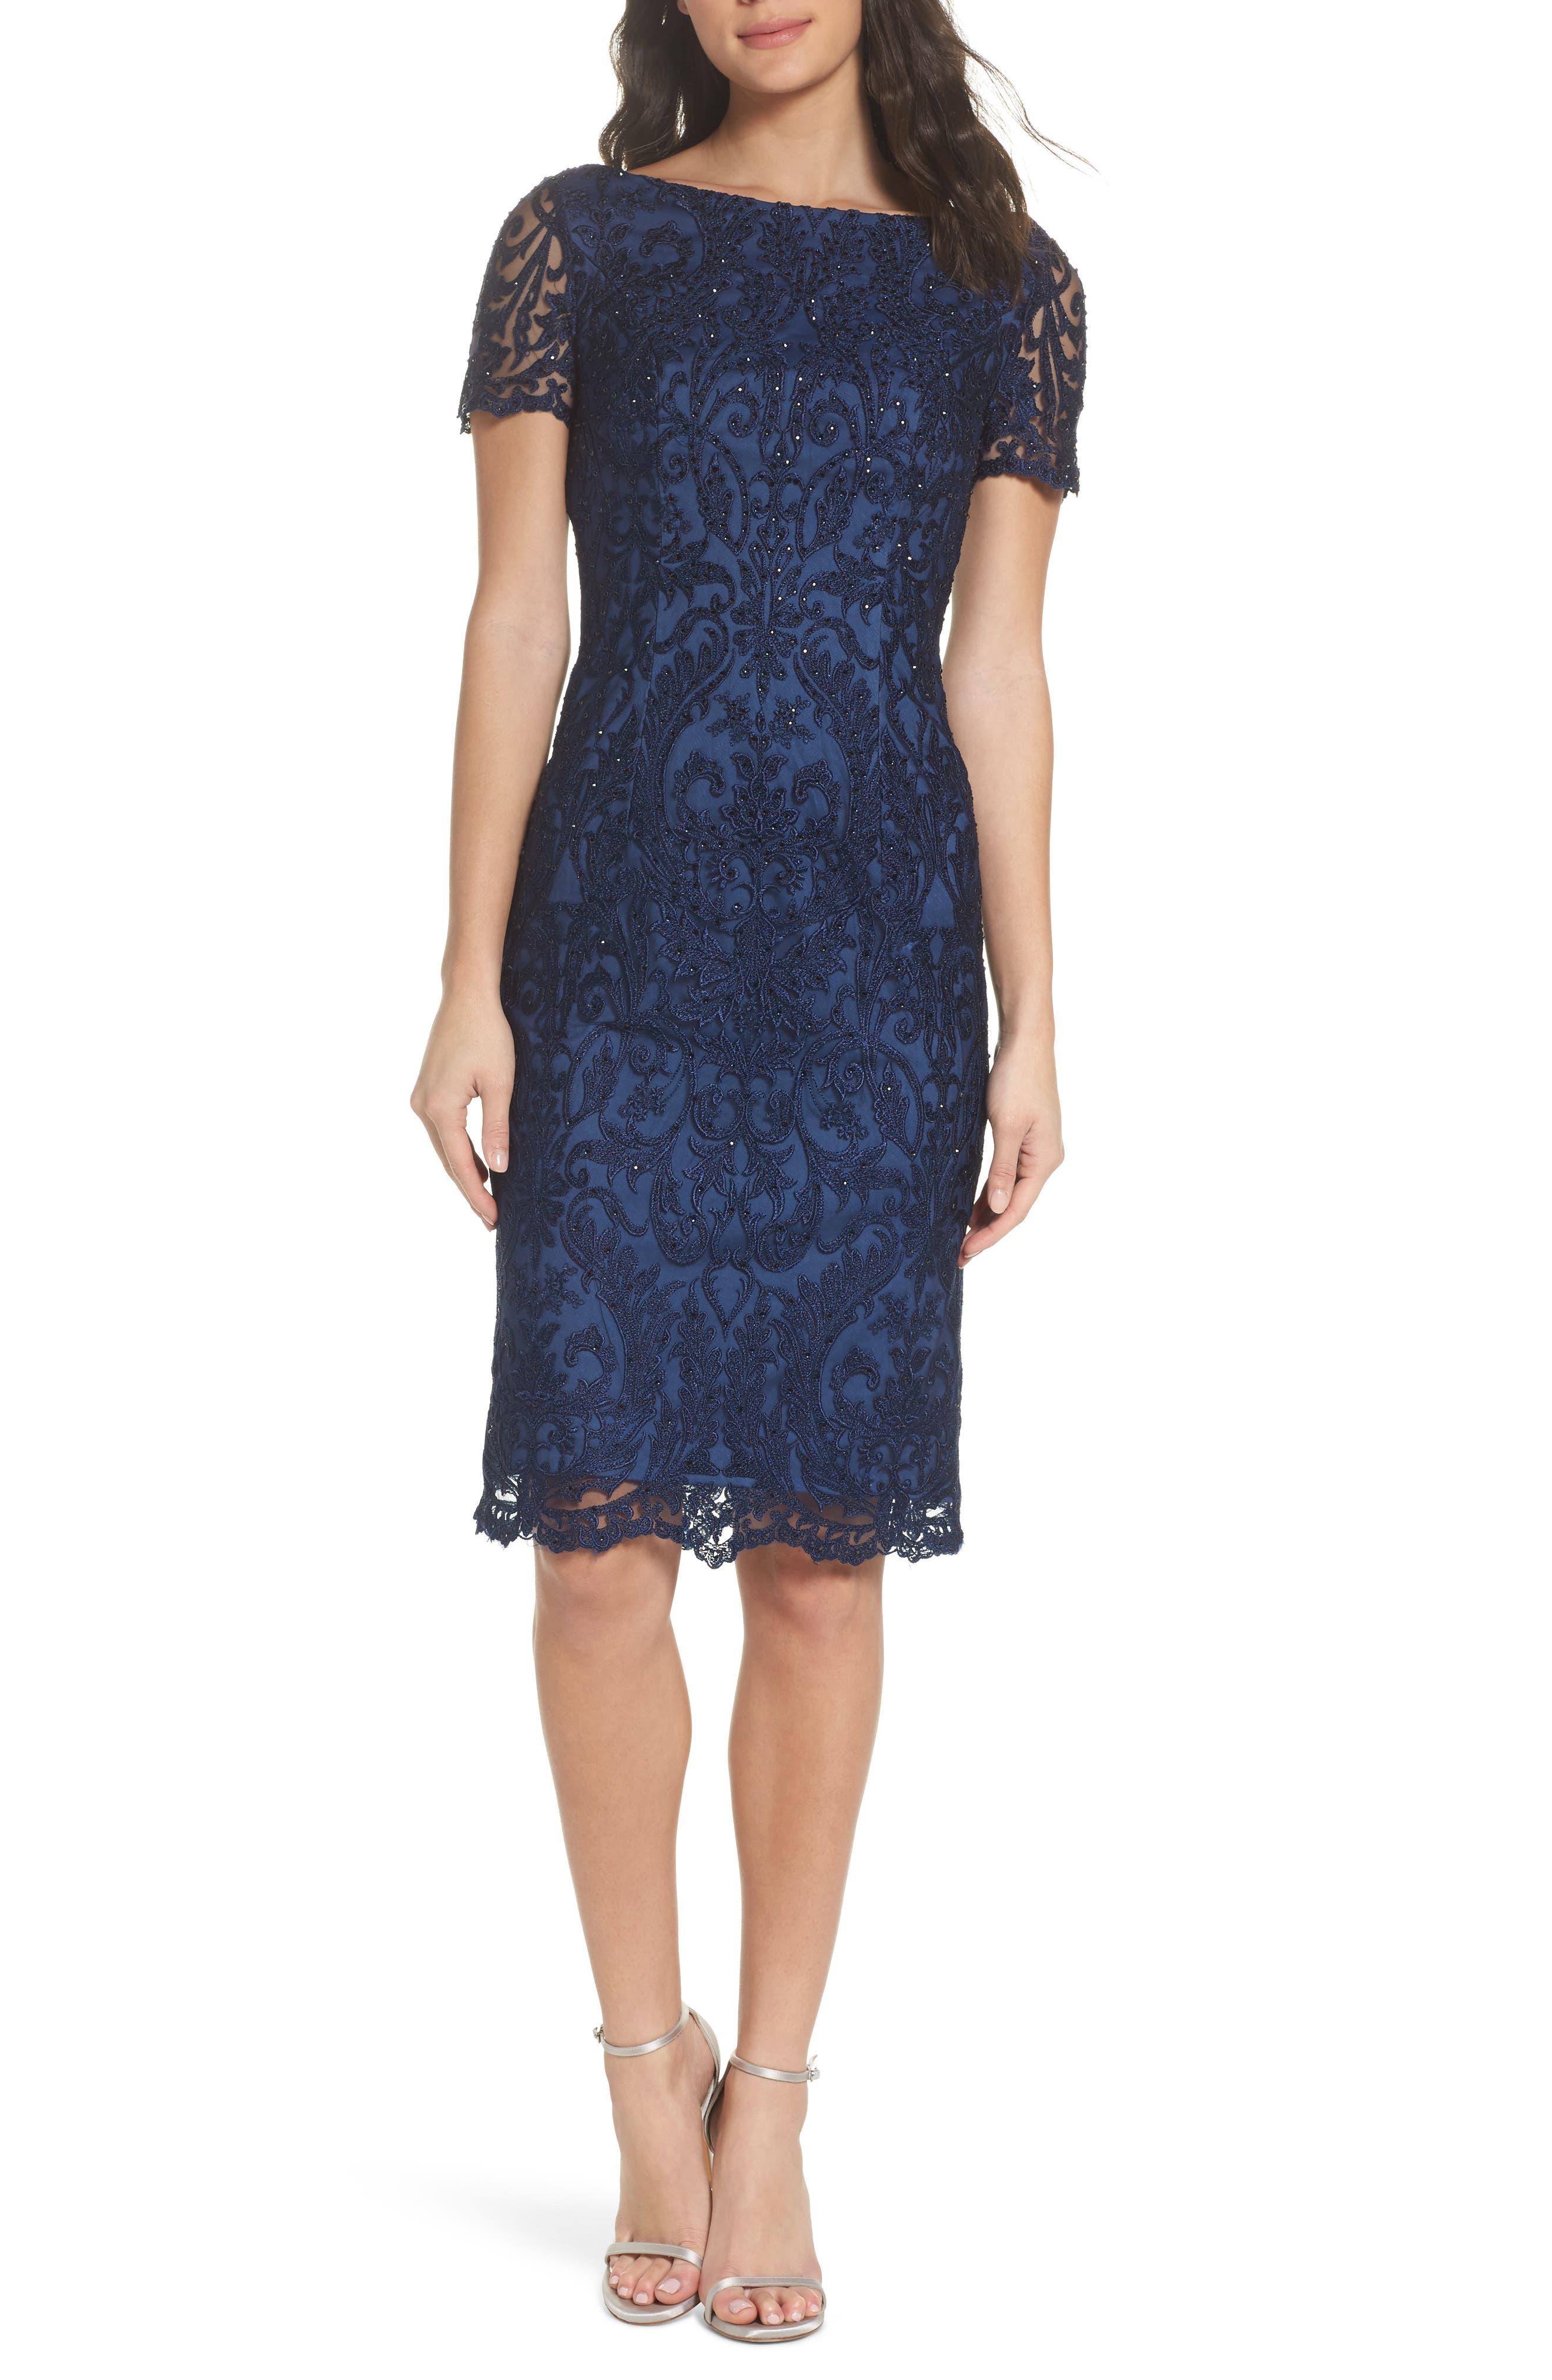 La Femme Beaded Lace Sheath Dress